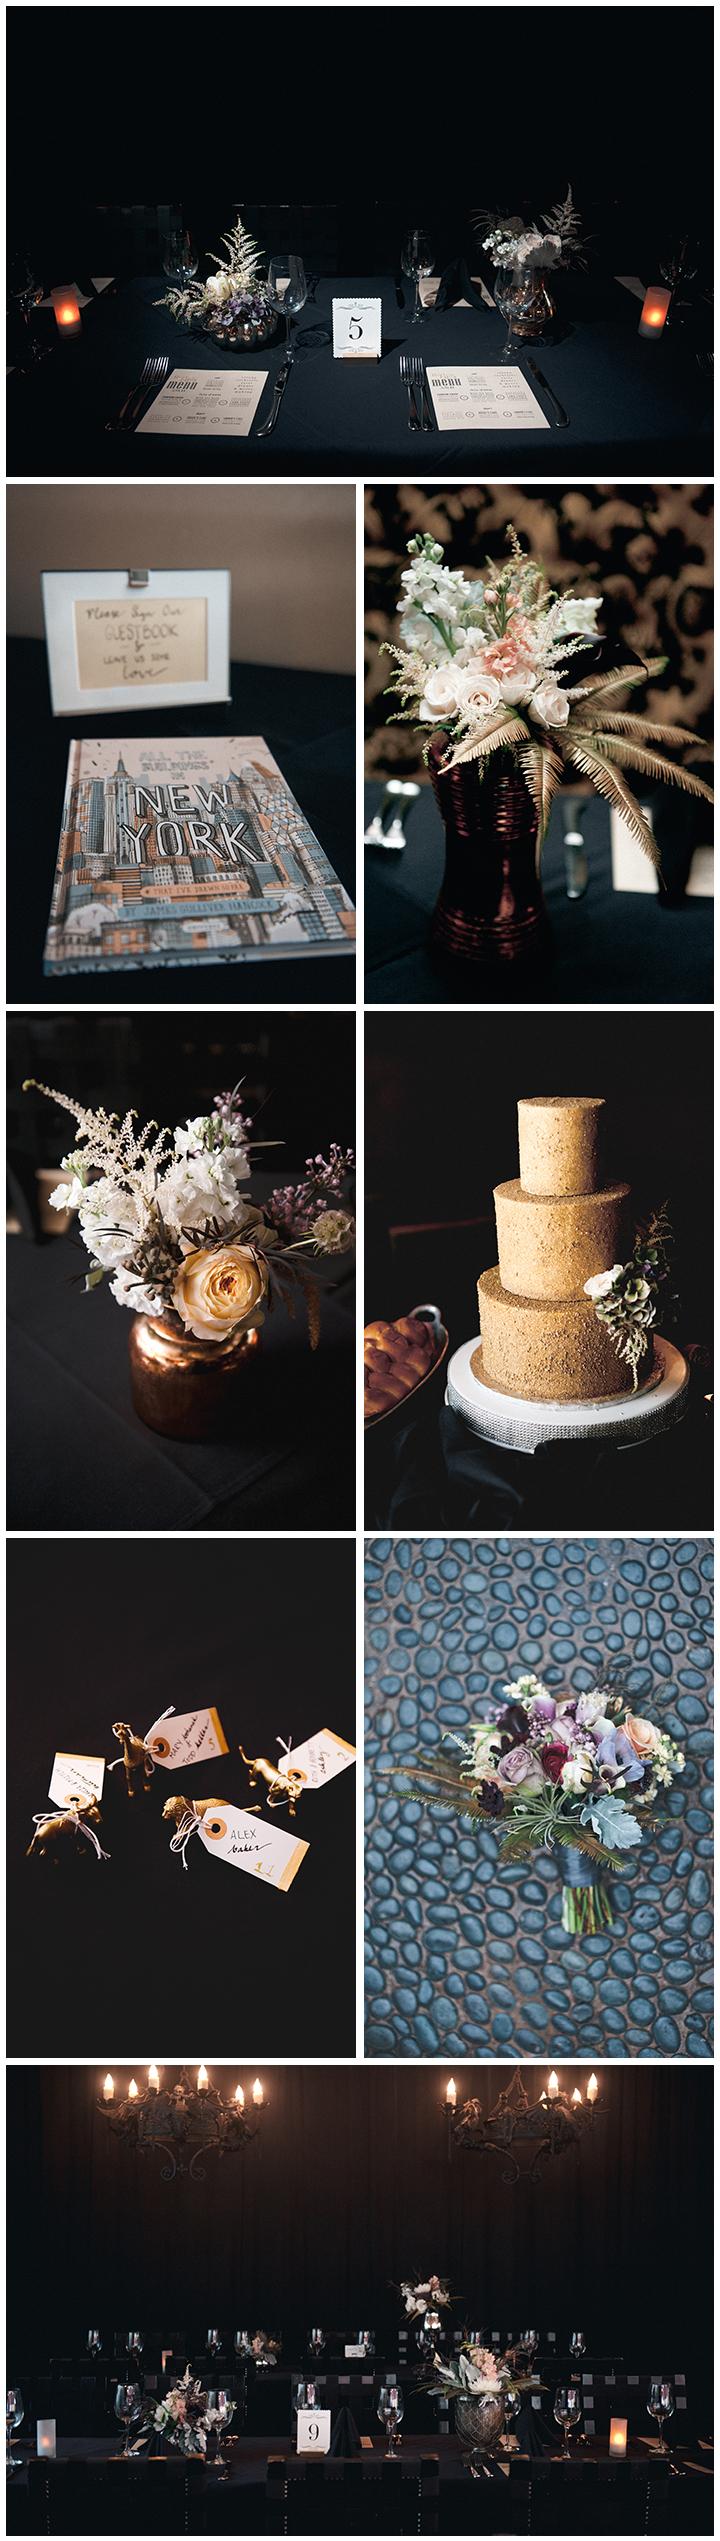 27-crescent-court-weddings.jpg